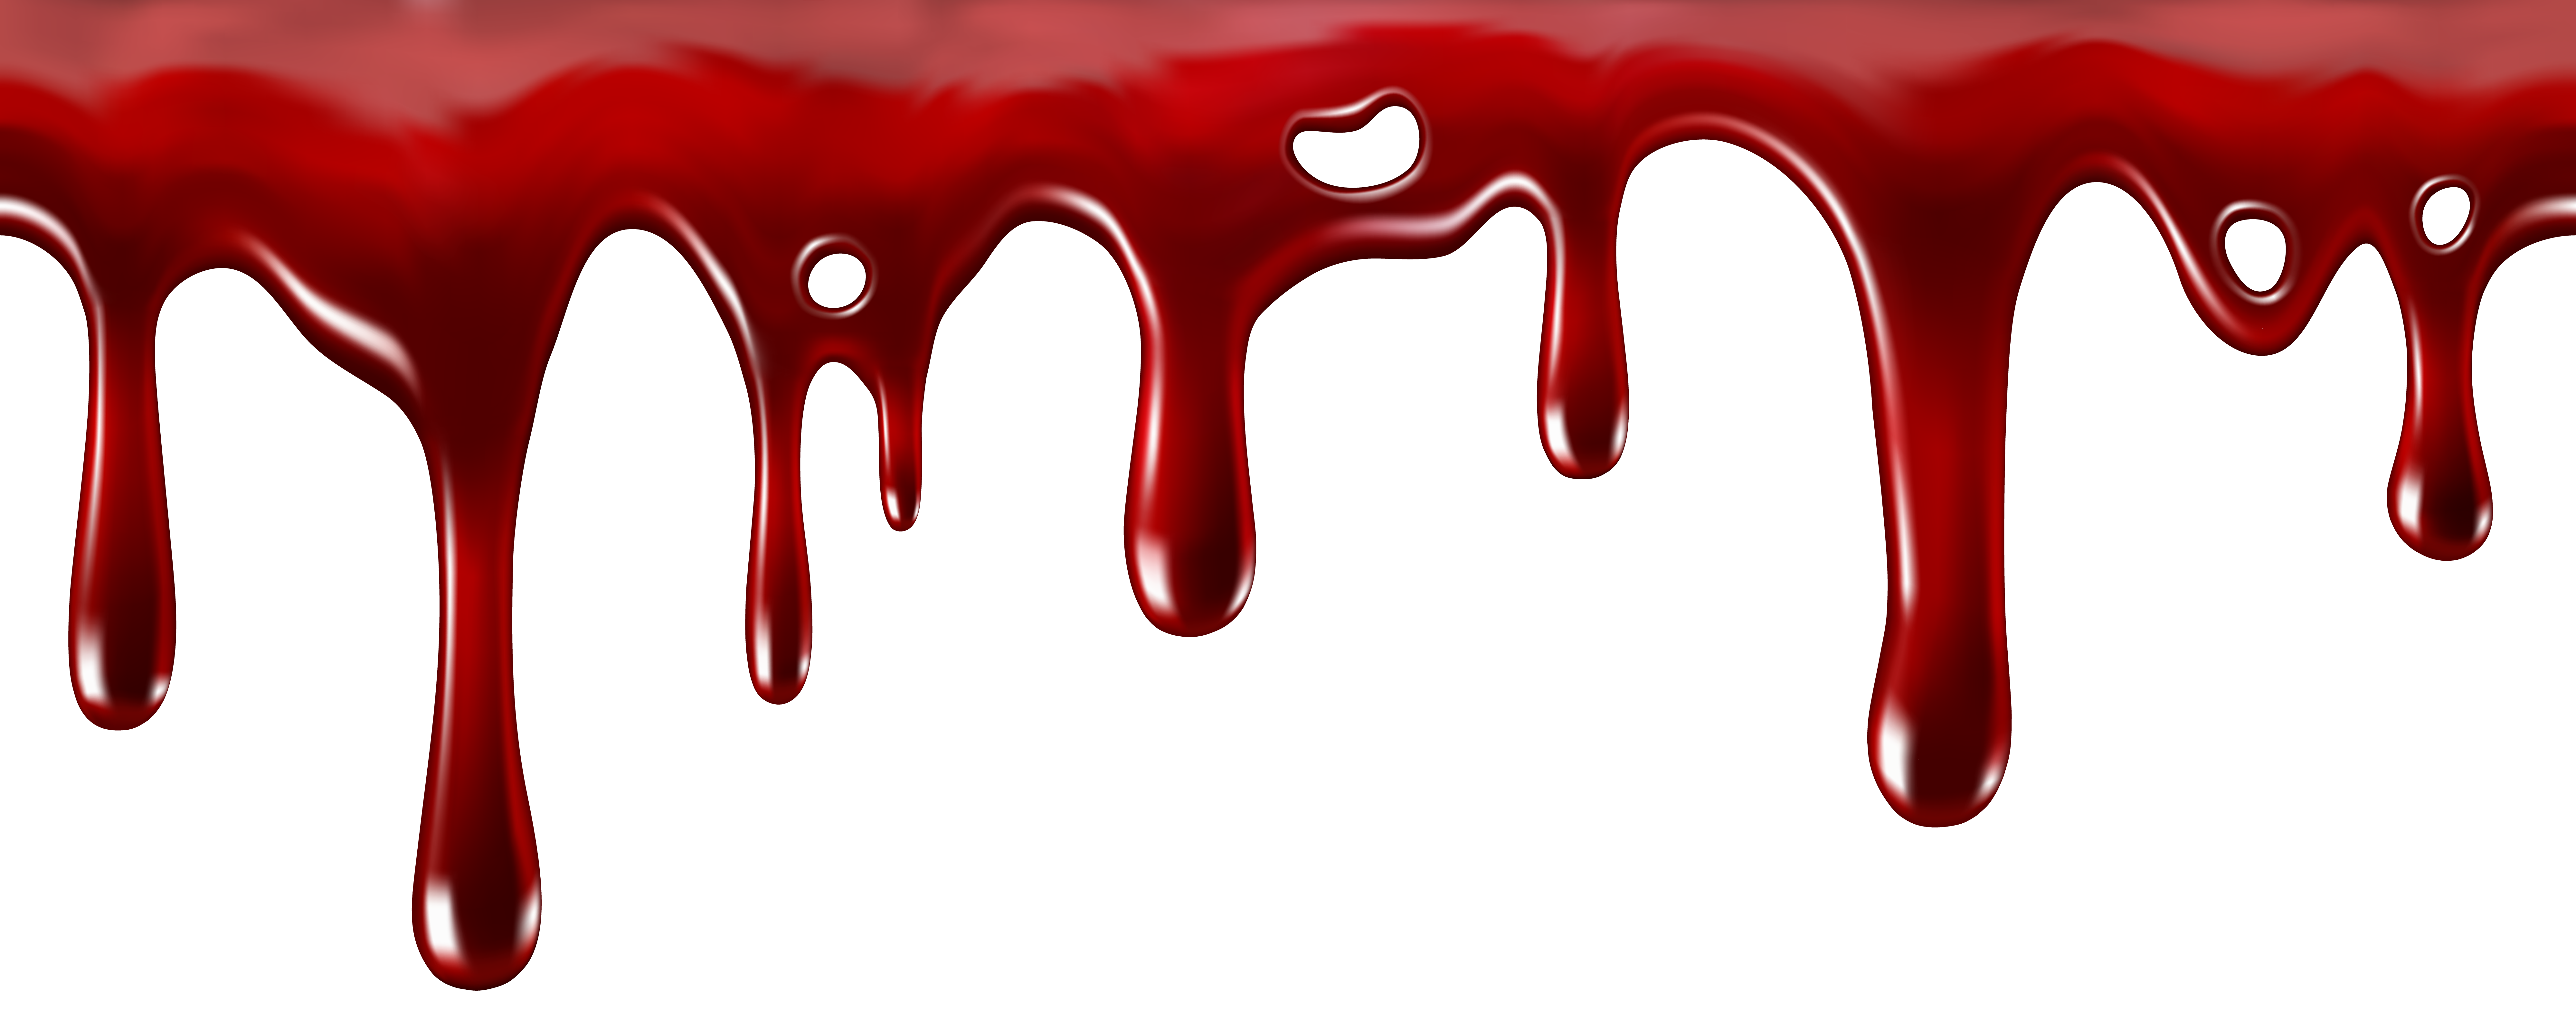 8000x3138 Films In Blood Art, Drip Art